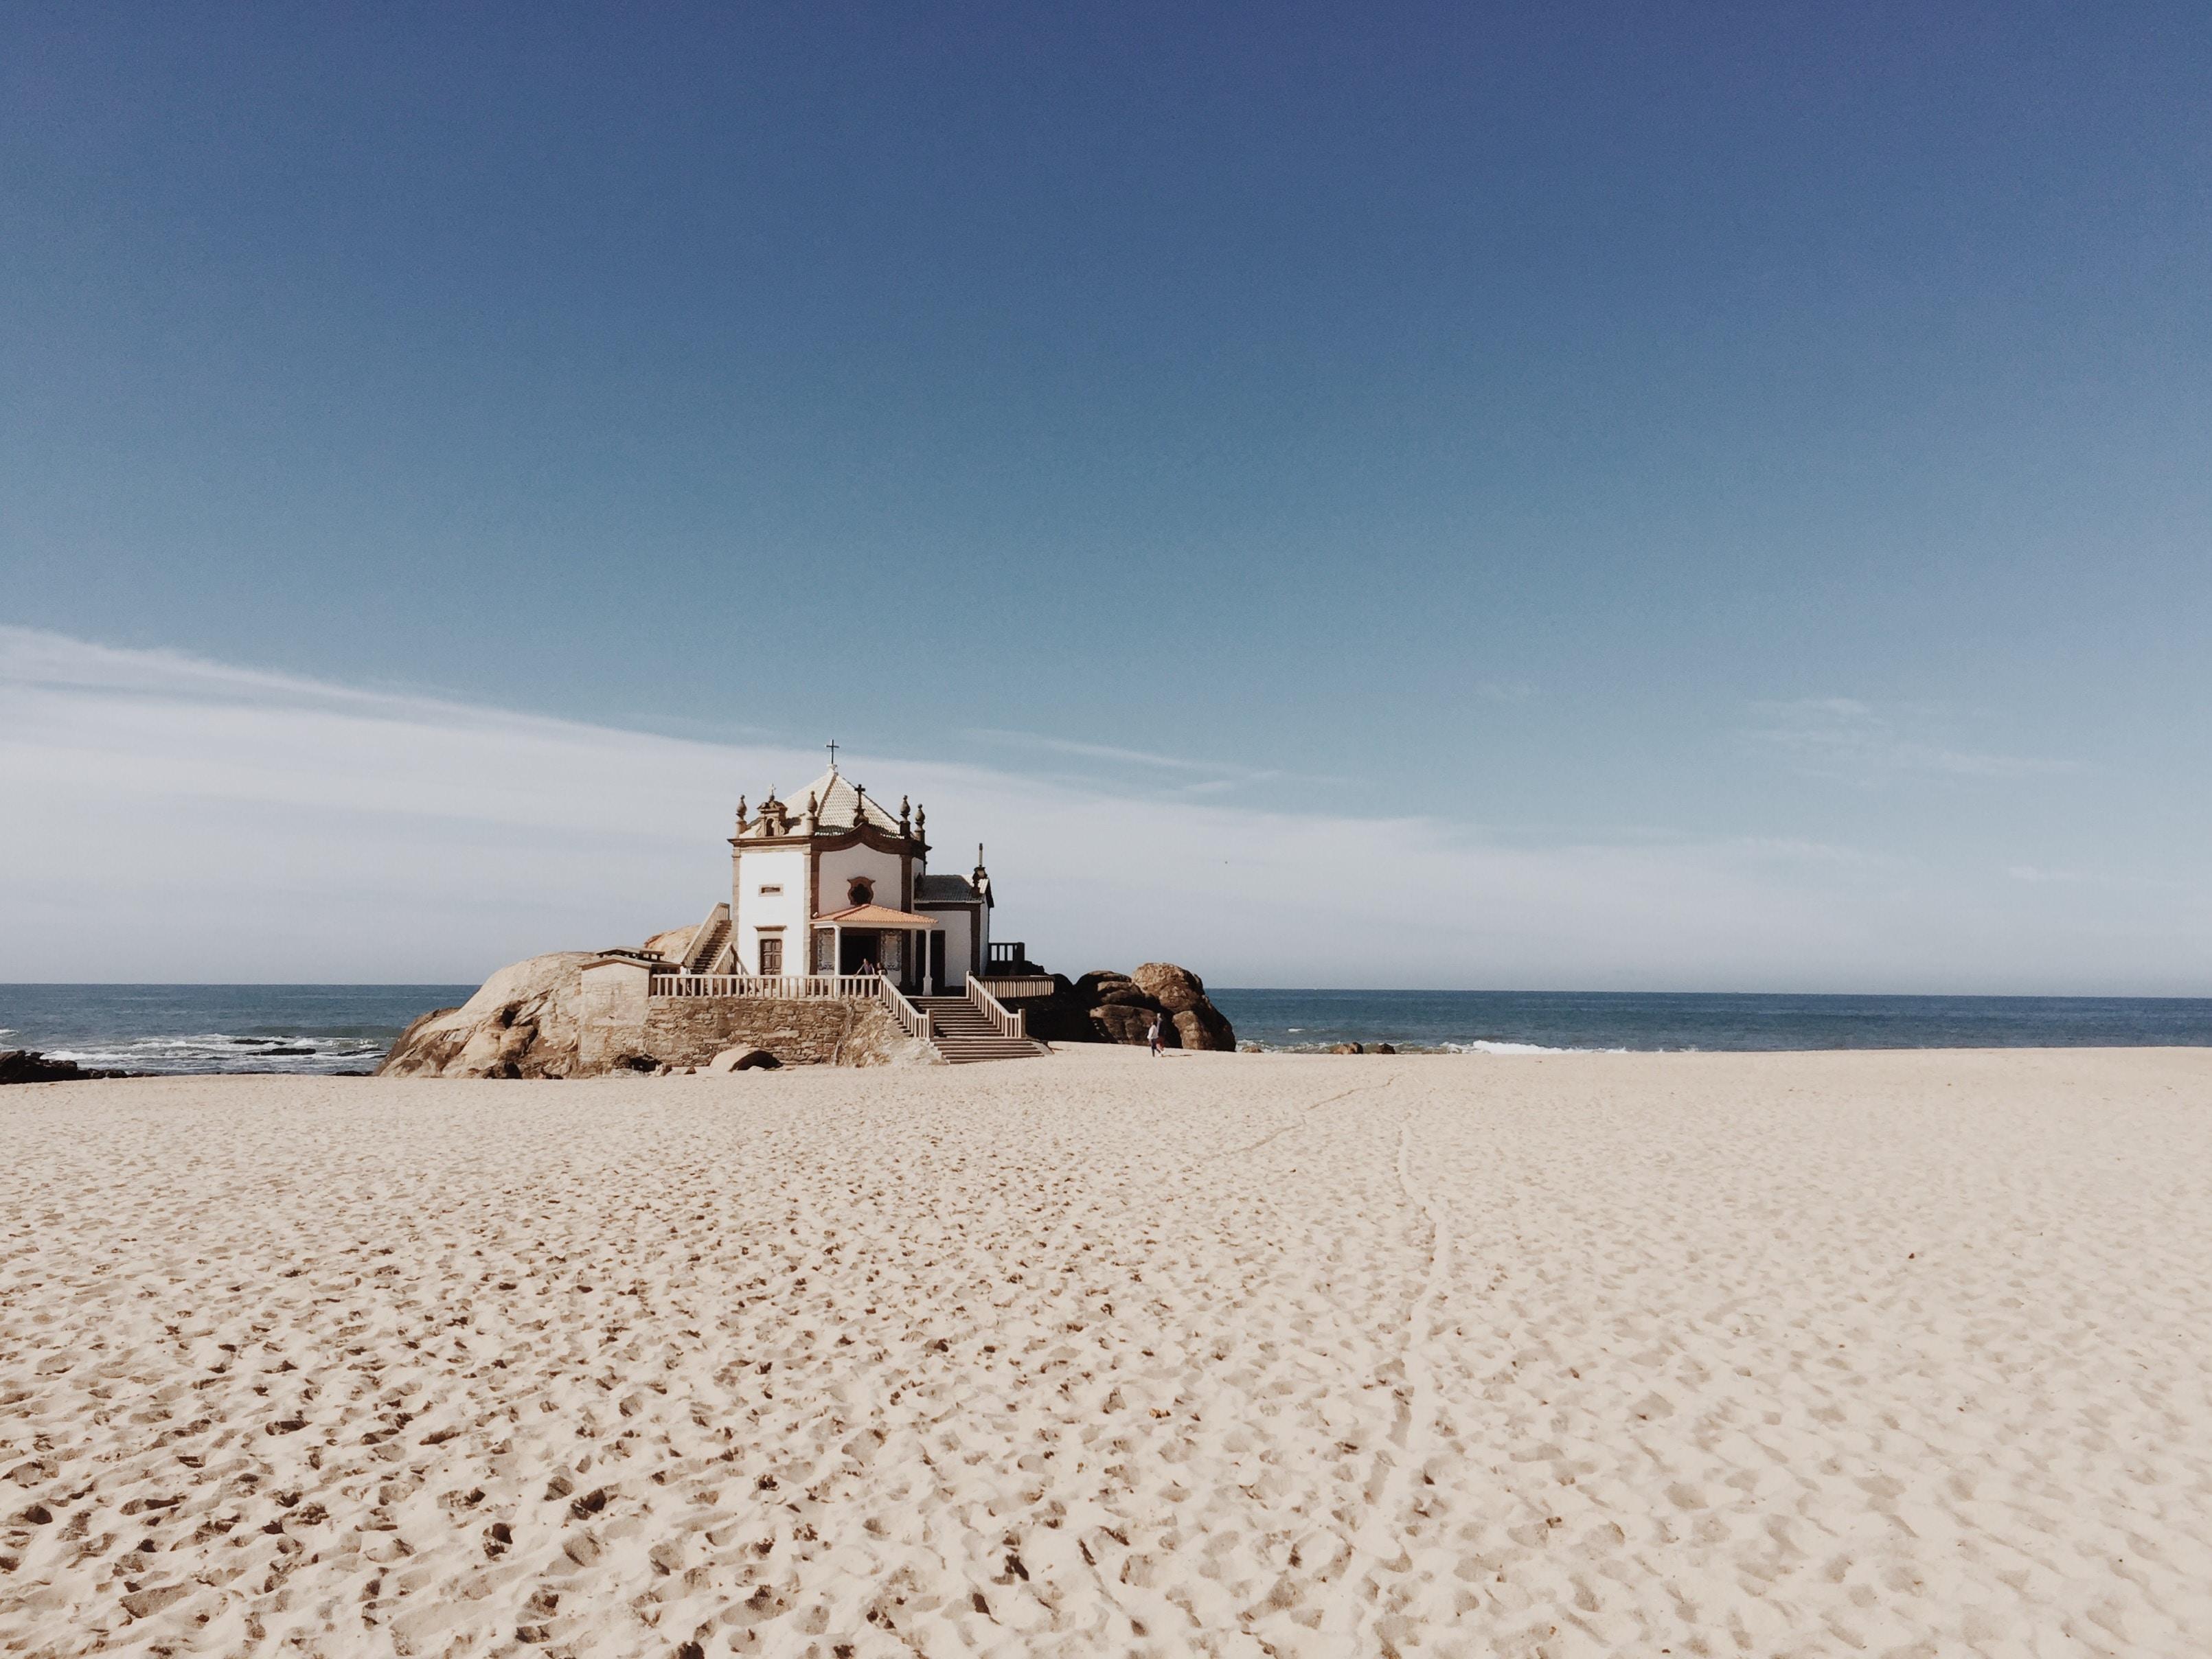 House on rocks at the sand beach in Vila Nova de Gaia, Porto, Portugal